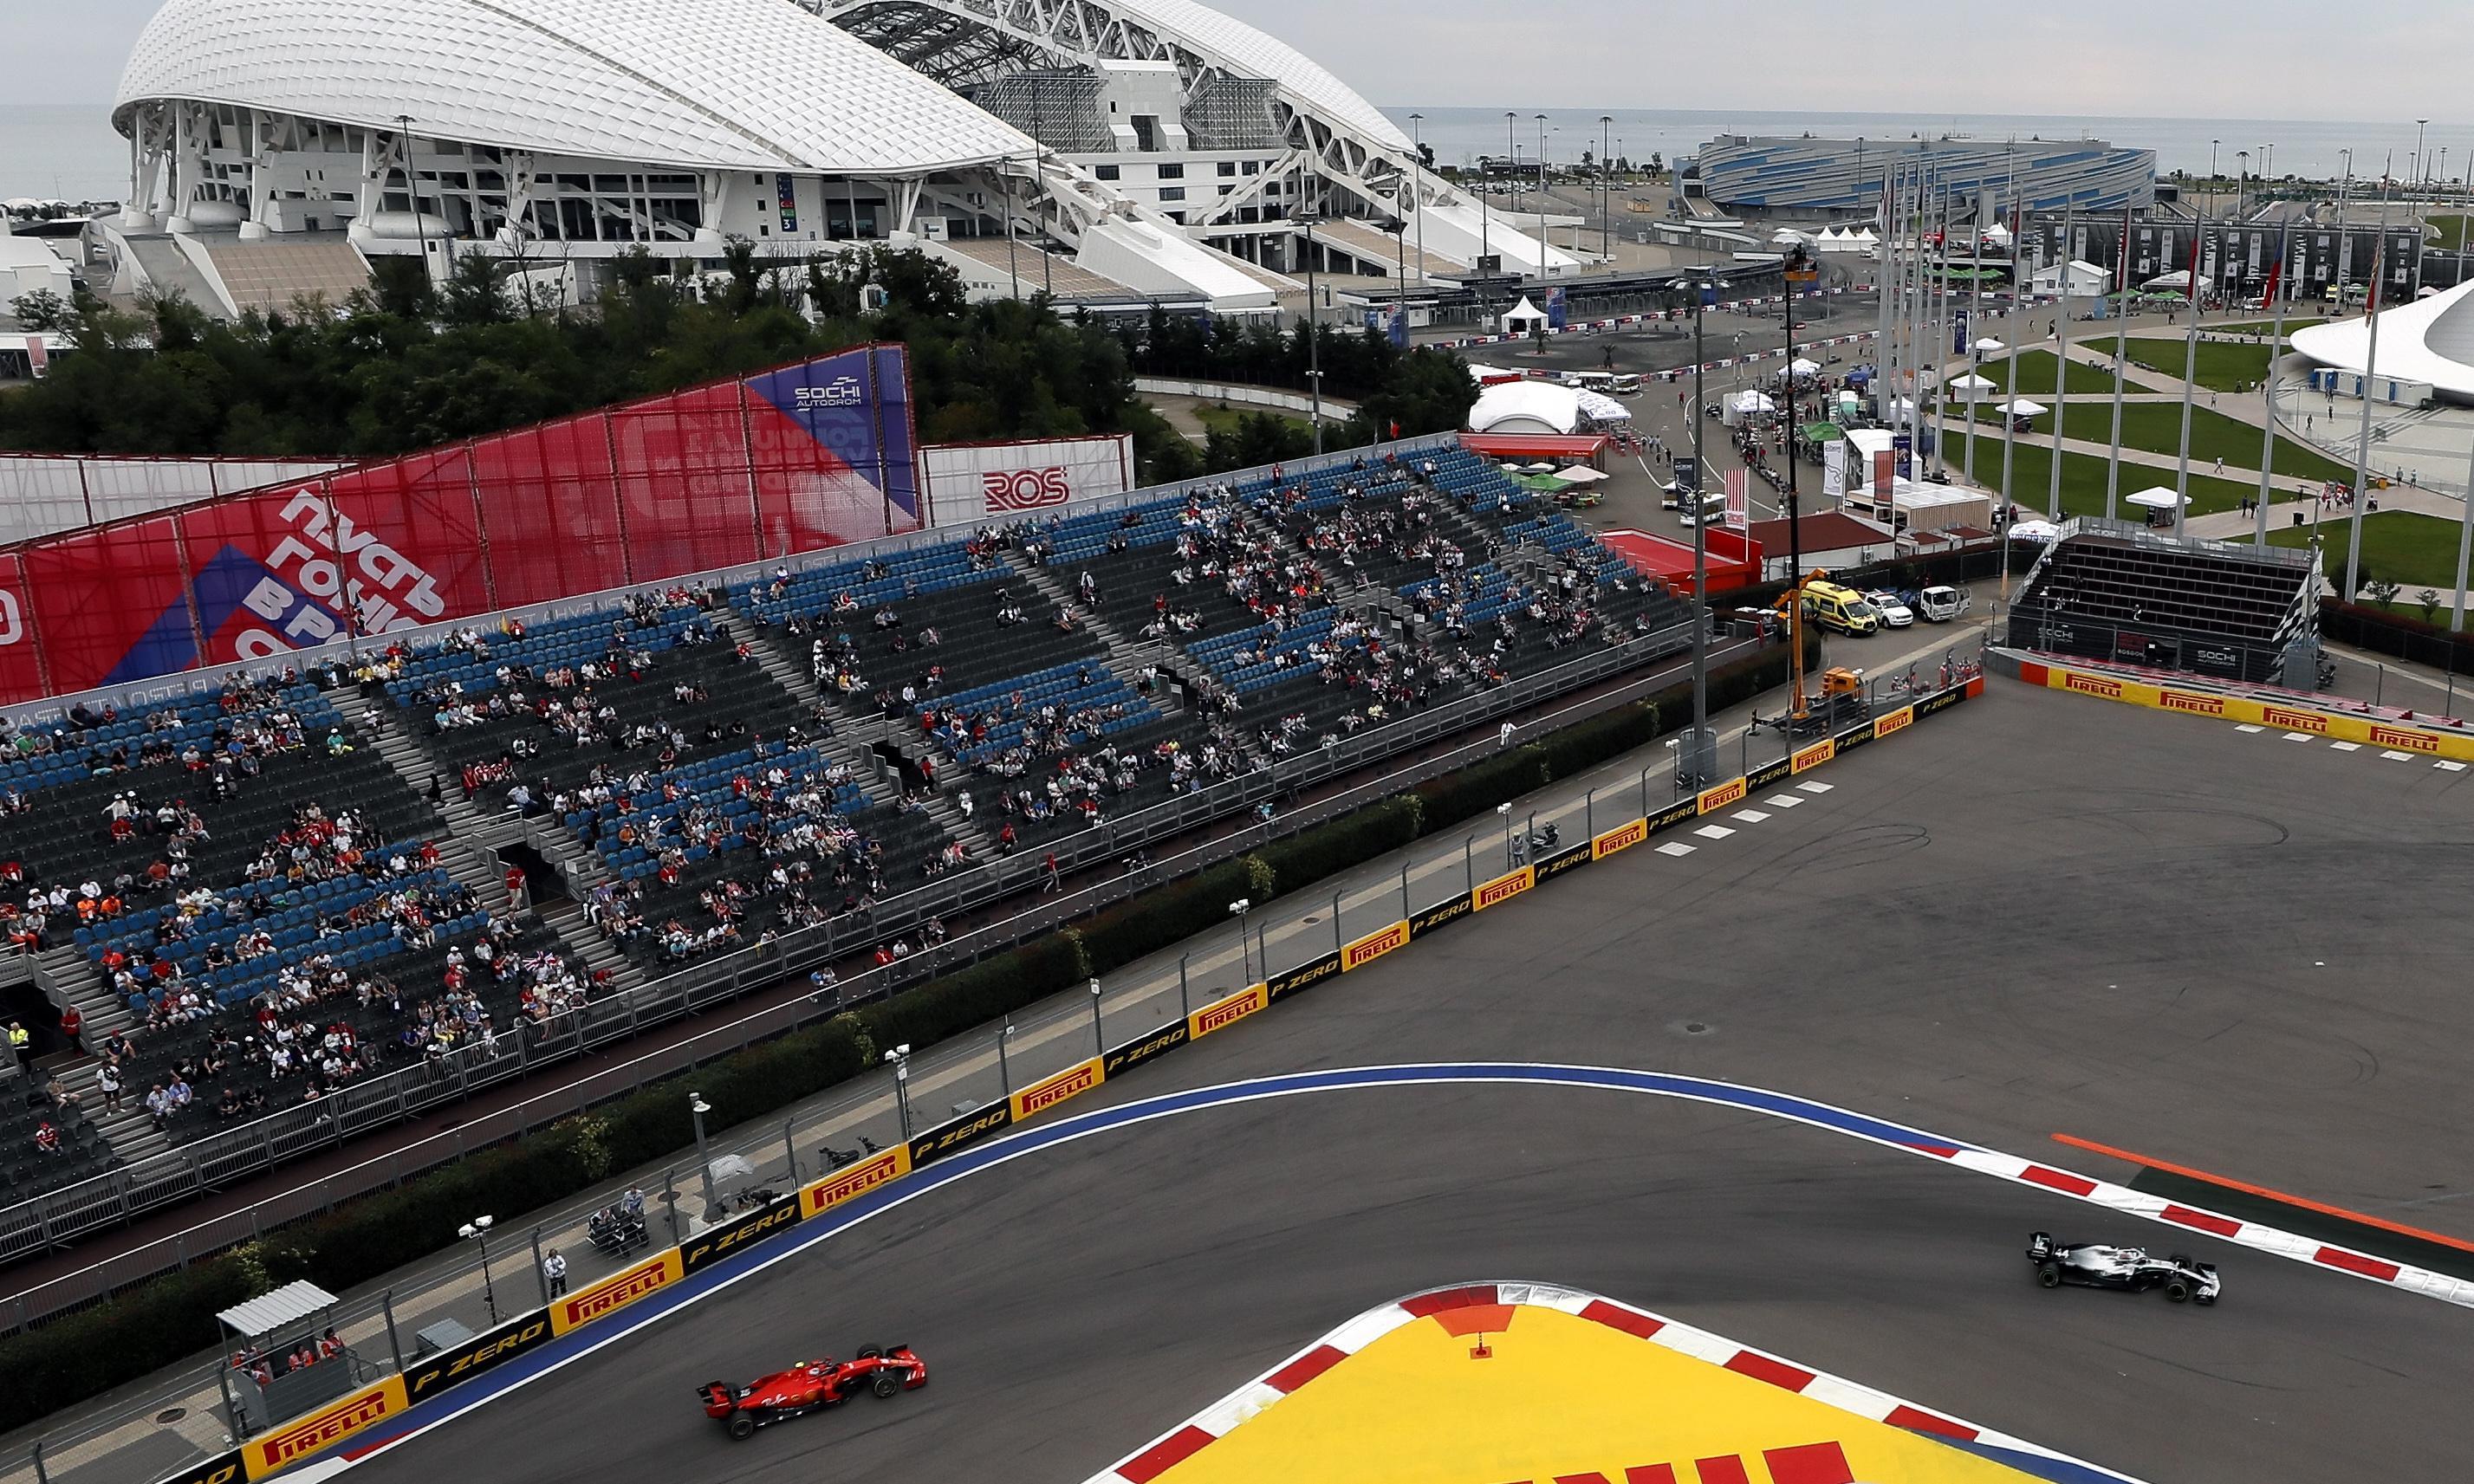 Sochi will test Ferrari revival but Charles Leclerc offers hopeful signs